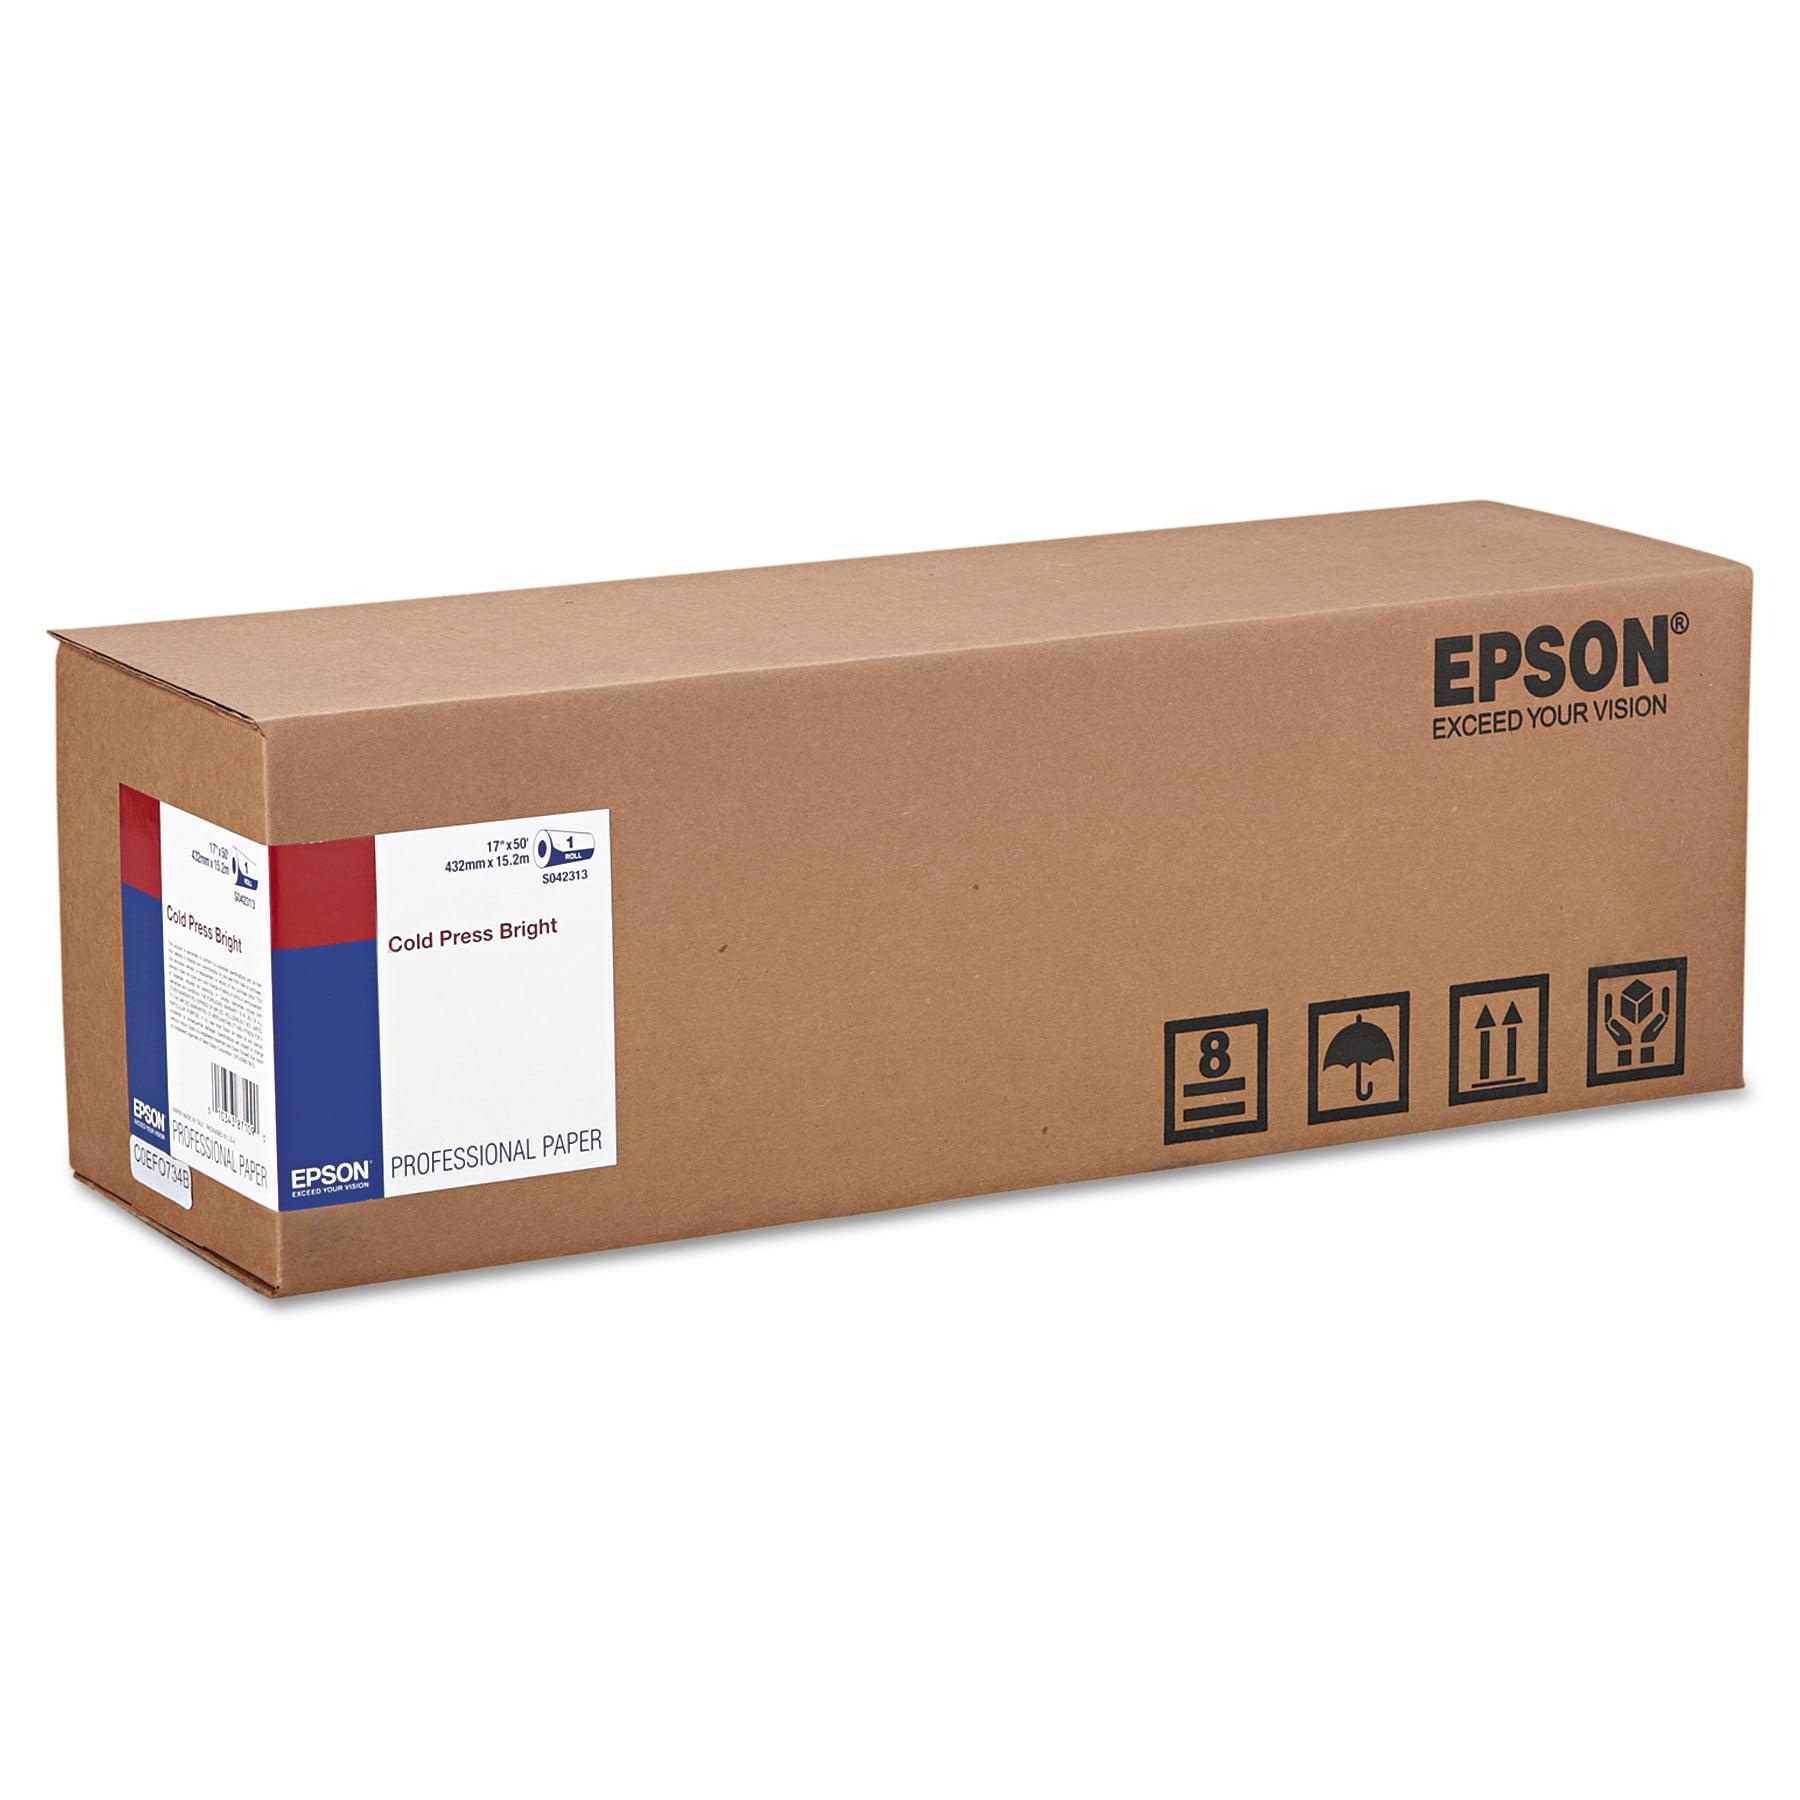 "Epson Cold Press Bright Fine Art Paper, 17"" x 50 ft, Bright White, Roll -EPSS042313"